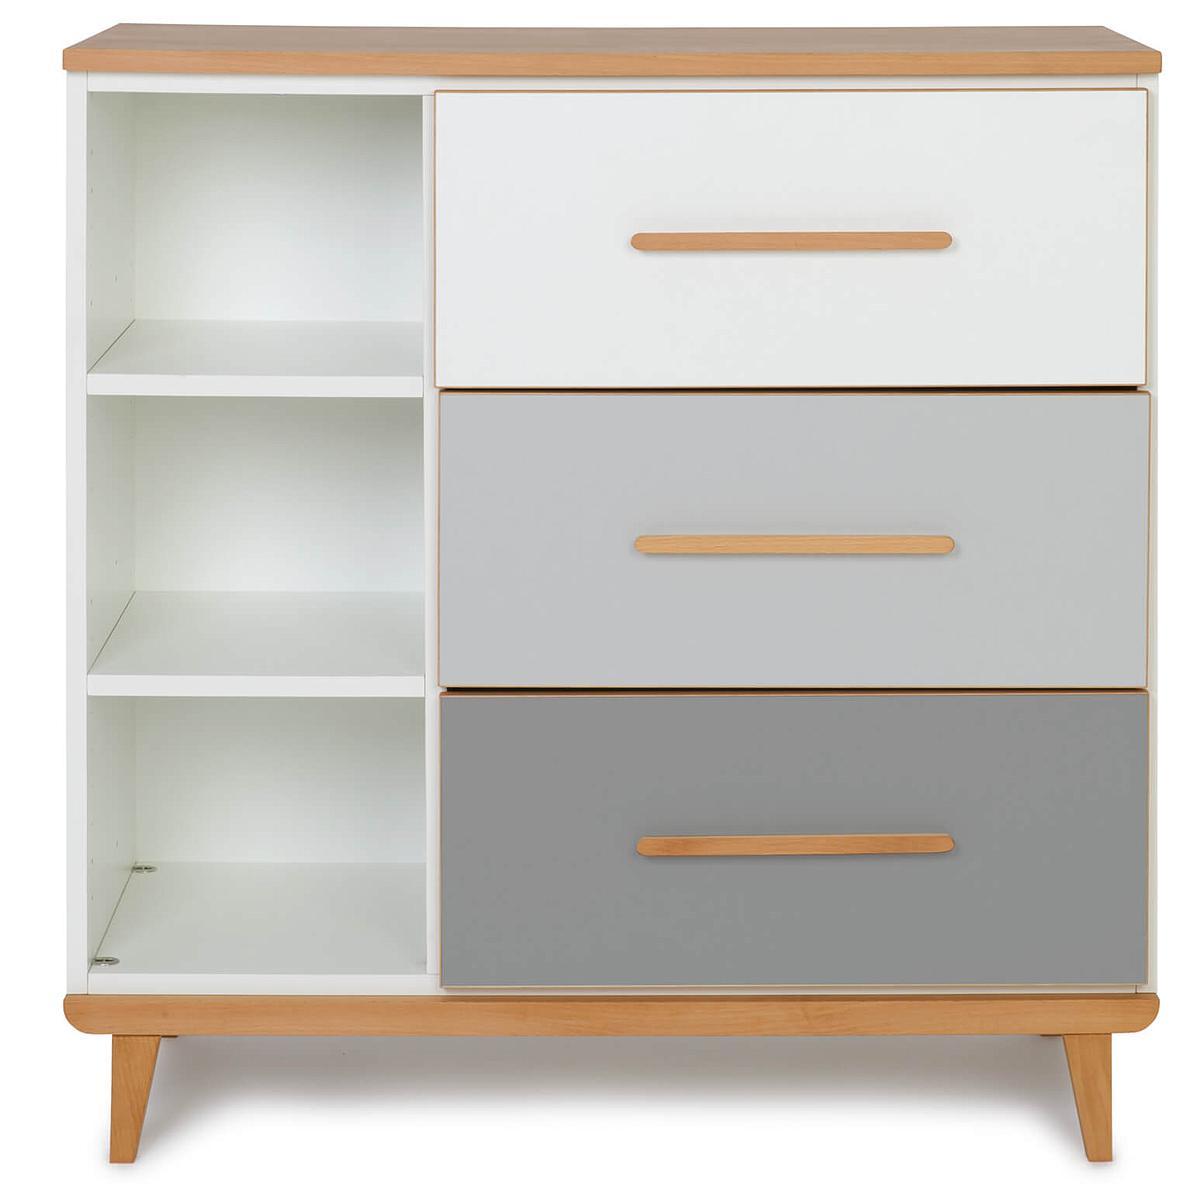 Commode 3 tiroirs NADO white-manhattan grey-slate grey